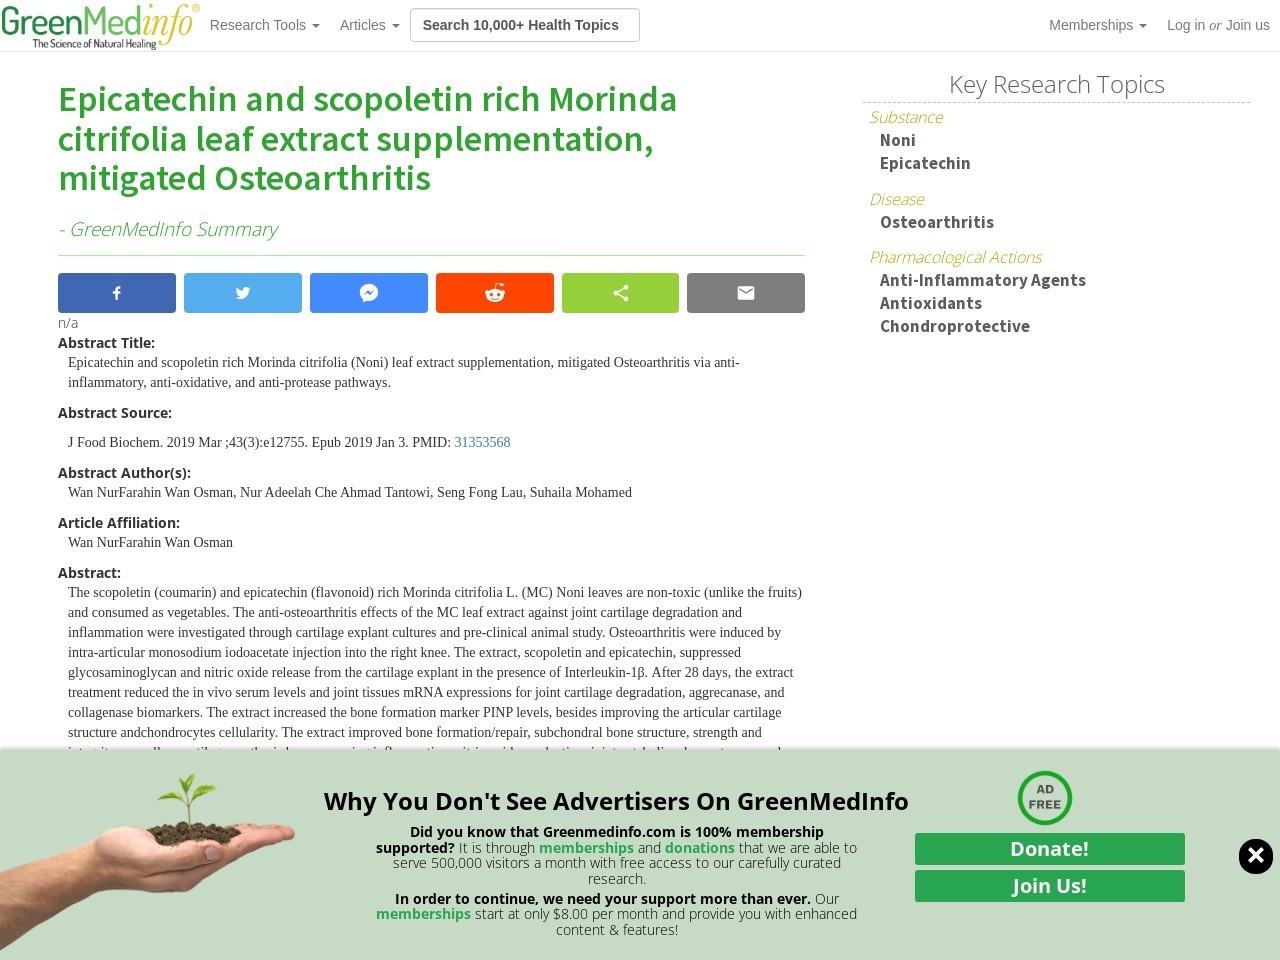 Epicatechin and scopoletin rich Morinda citrifolia leaf extract supplementation, mitigated Osteoarthritis